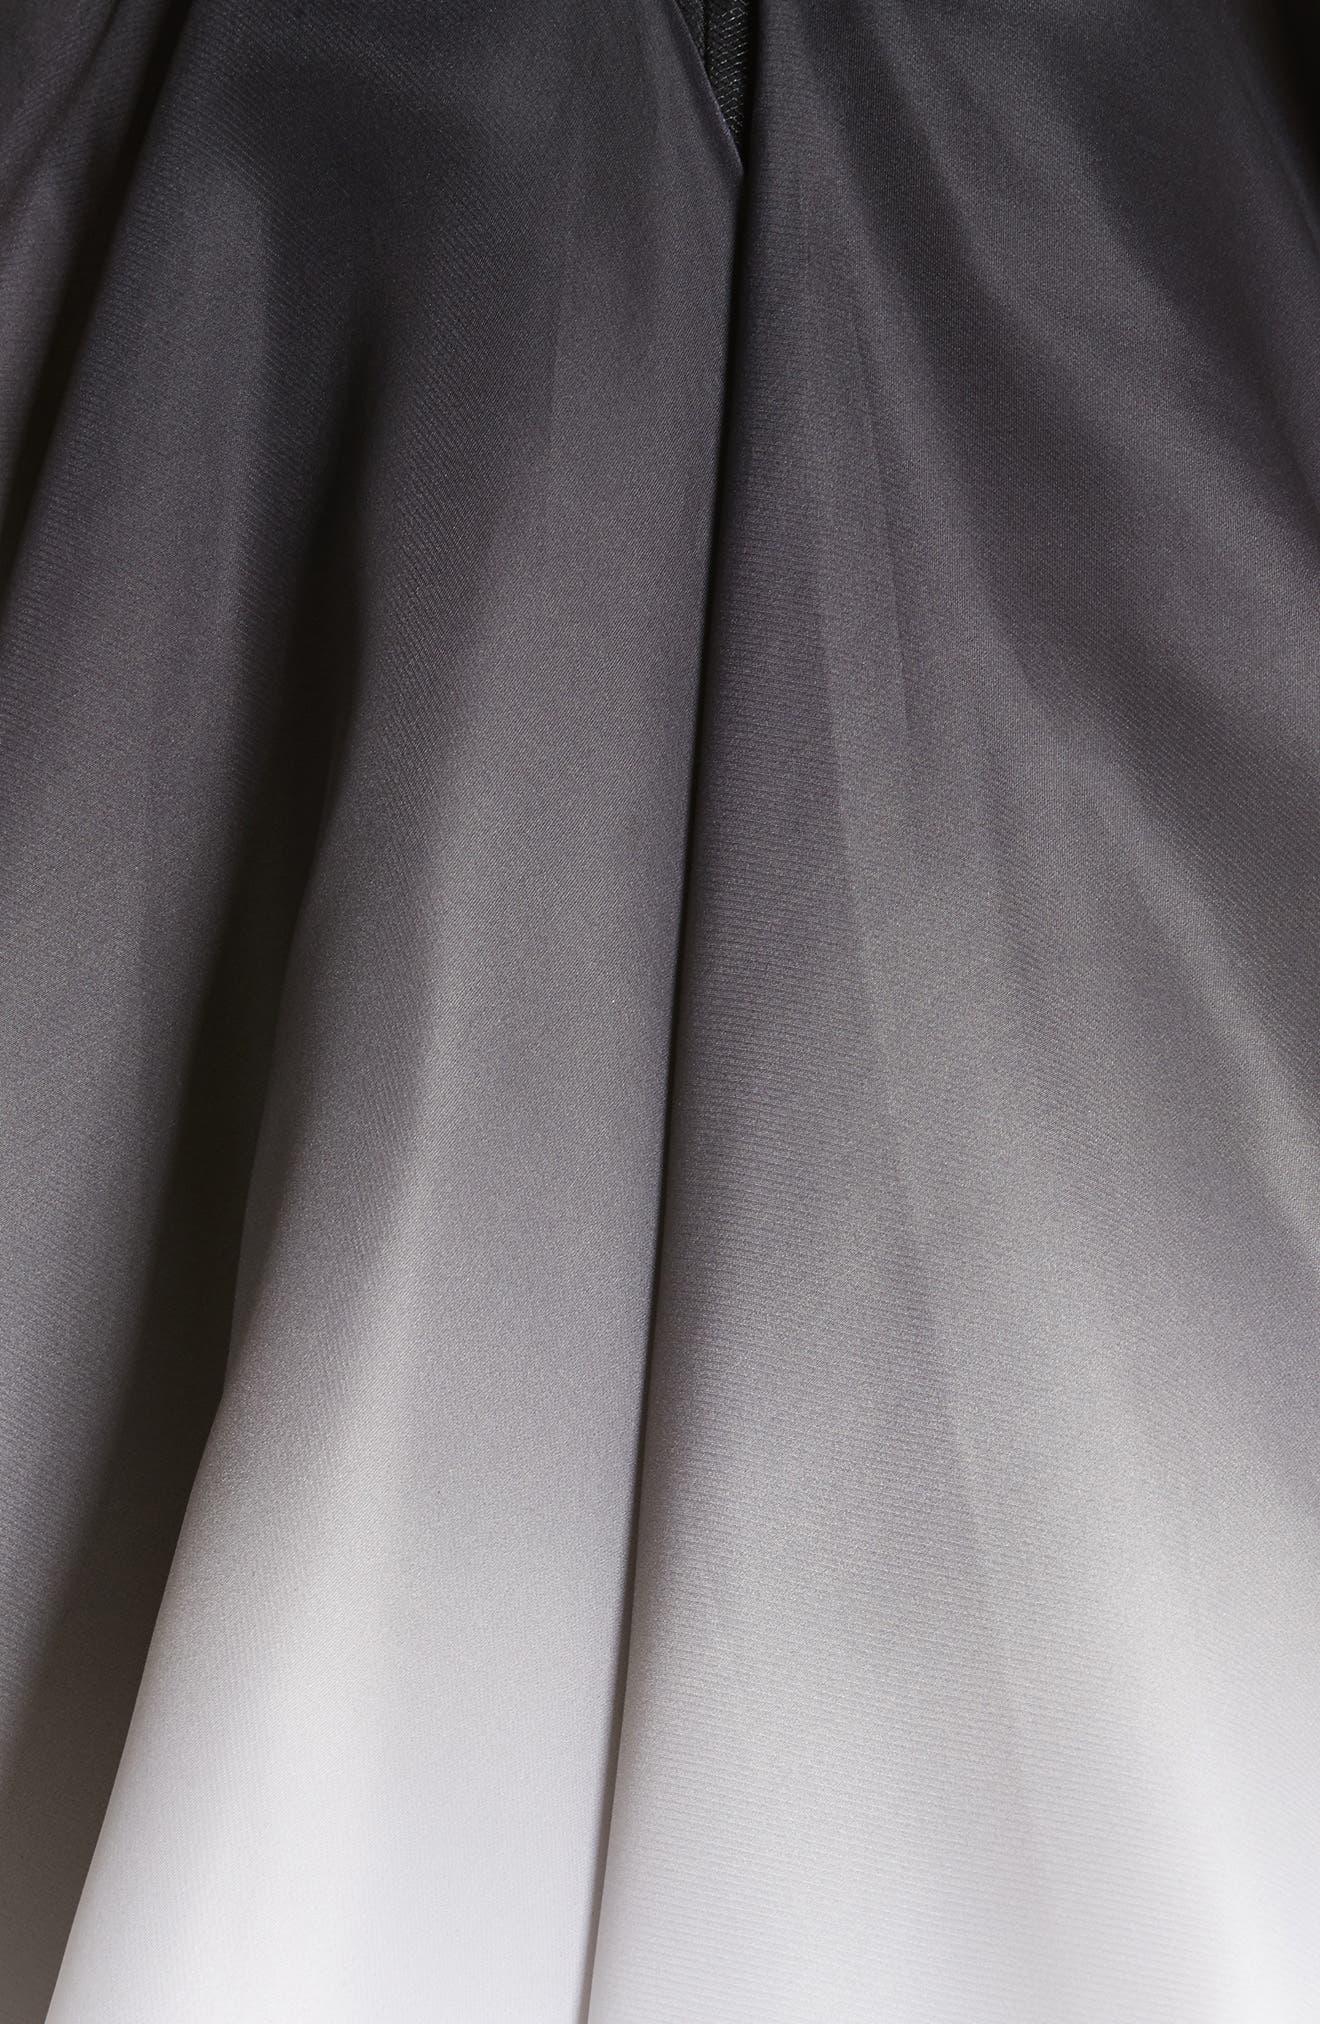 Ombré Strapless Tea Length Dress,                             Alternate thumbnail 5, color,                             001